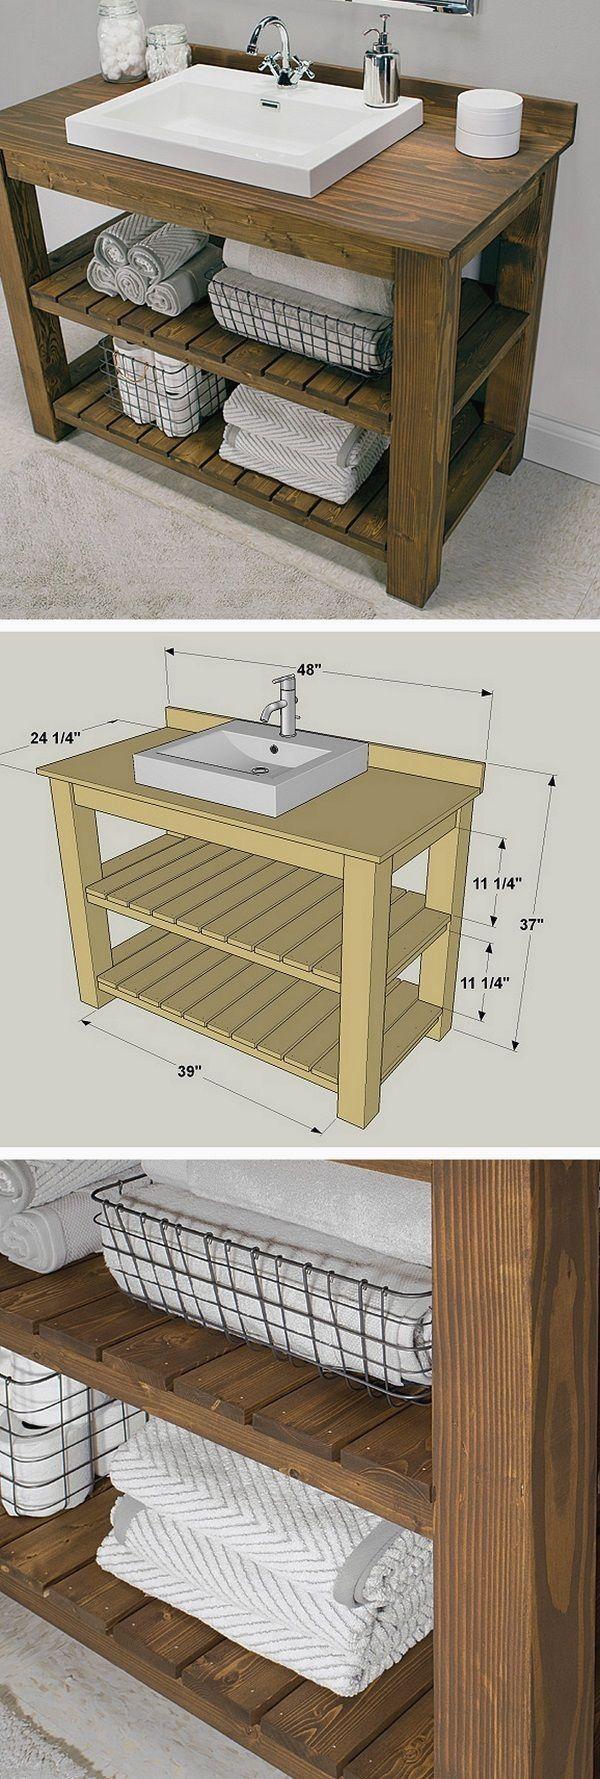 24 Easy Diy Bathroom Vanity Plans For A Quick Remodel Rustic Bathroom Designs Rustic Bathroom Vanities Diy Bathroom Vanity [ 1779 x 600 Pixel ]